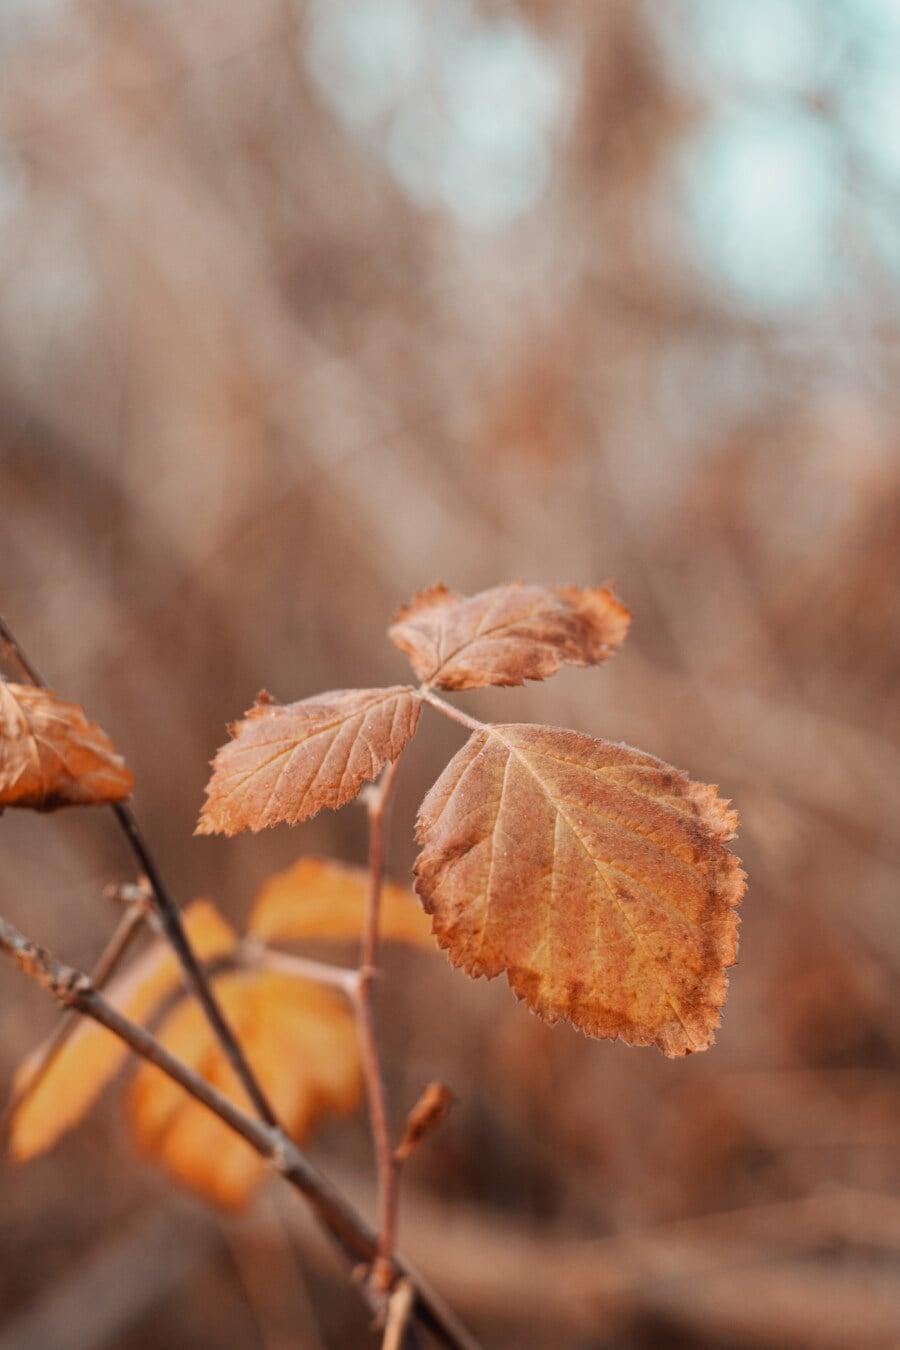 branchlet, leaf, autumn season, focus, close-up, nature, wood, outdoors, tree, blur